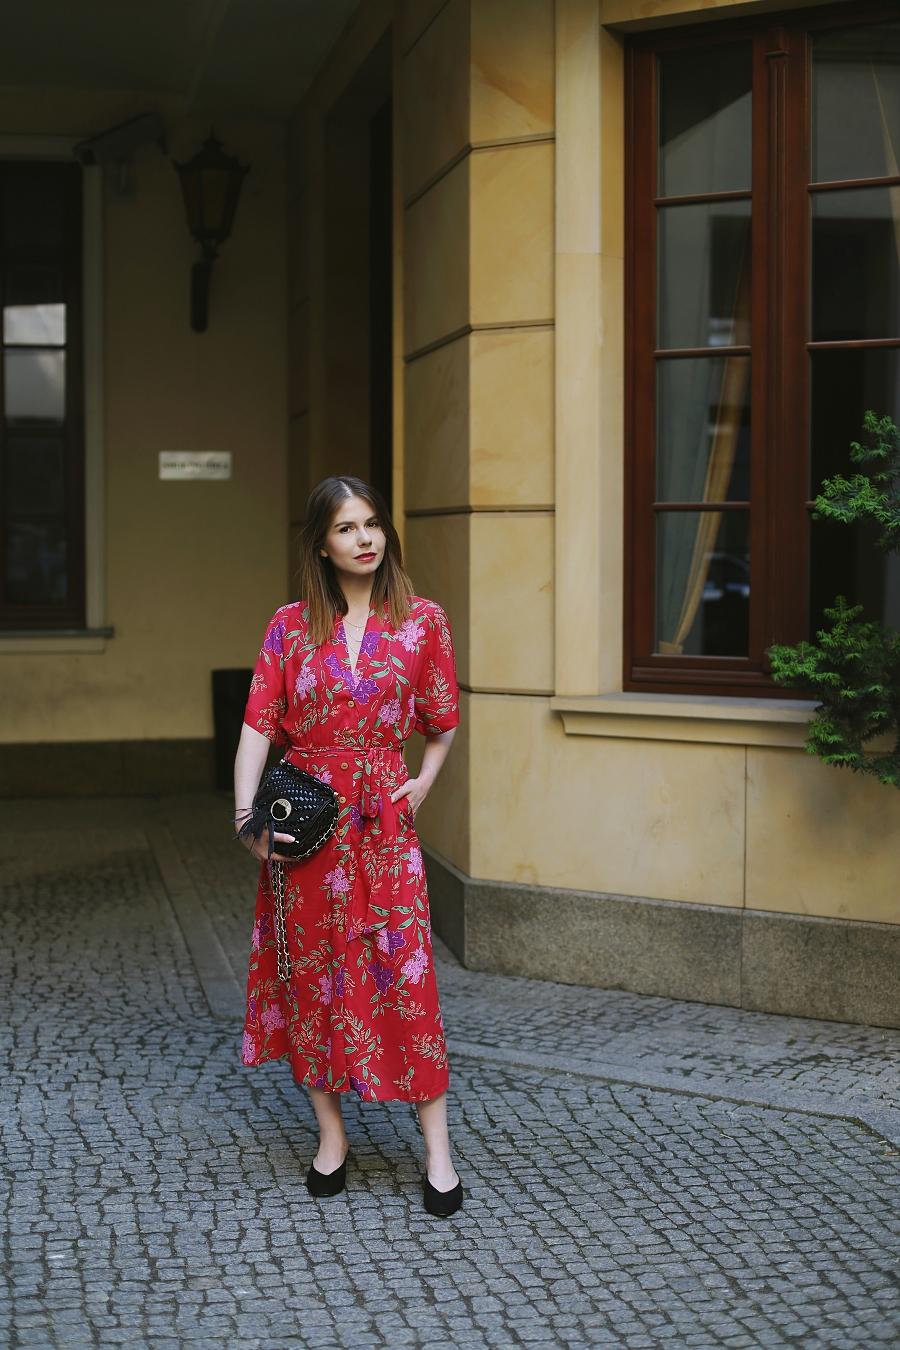 ANSWEAR.com total look - czerwona kwiecista sukienka 7/8, klapki mule, pleciona torebka Just Cavalli